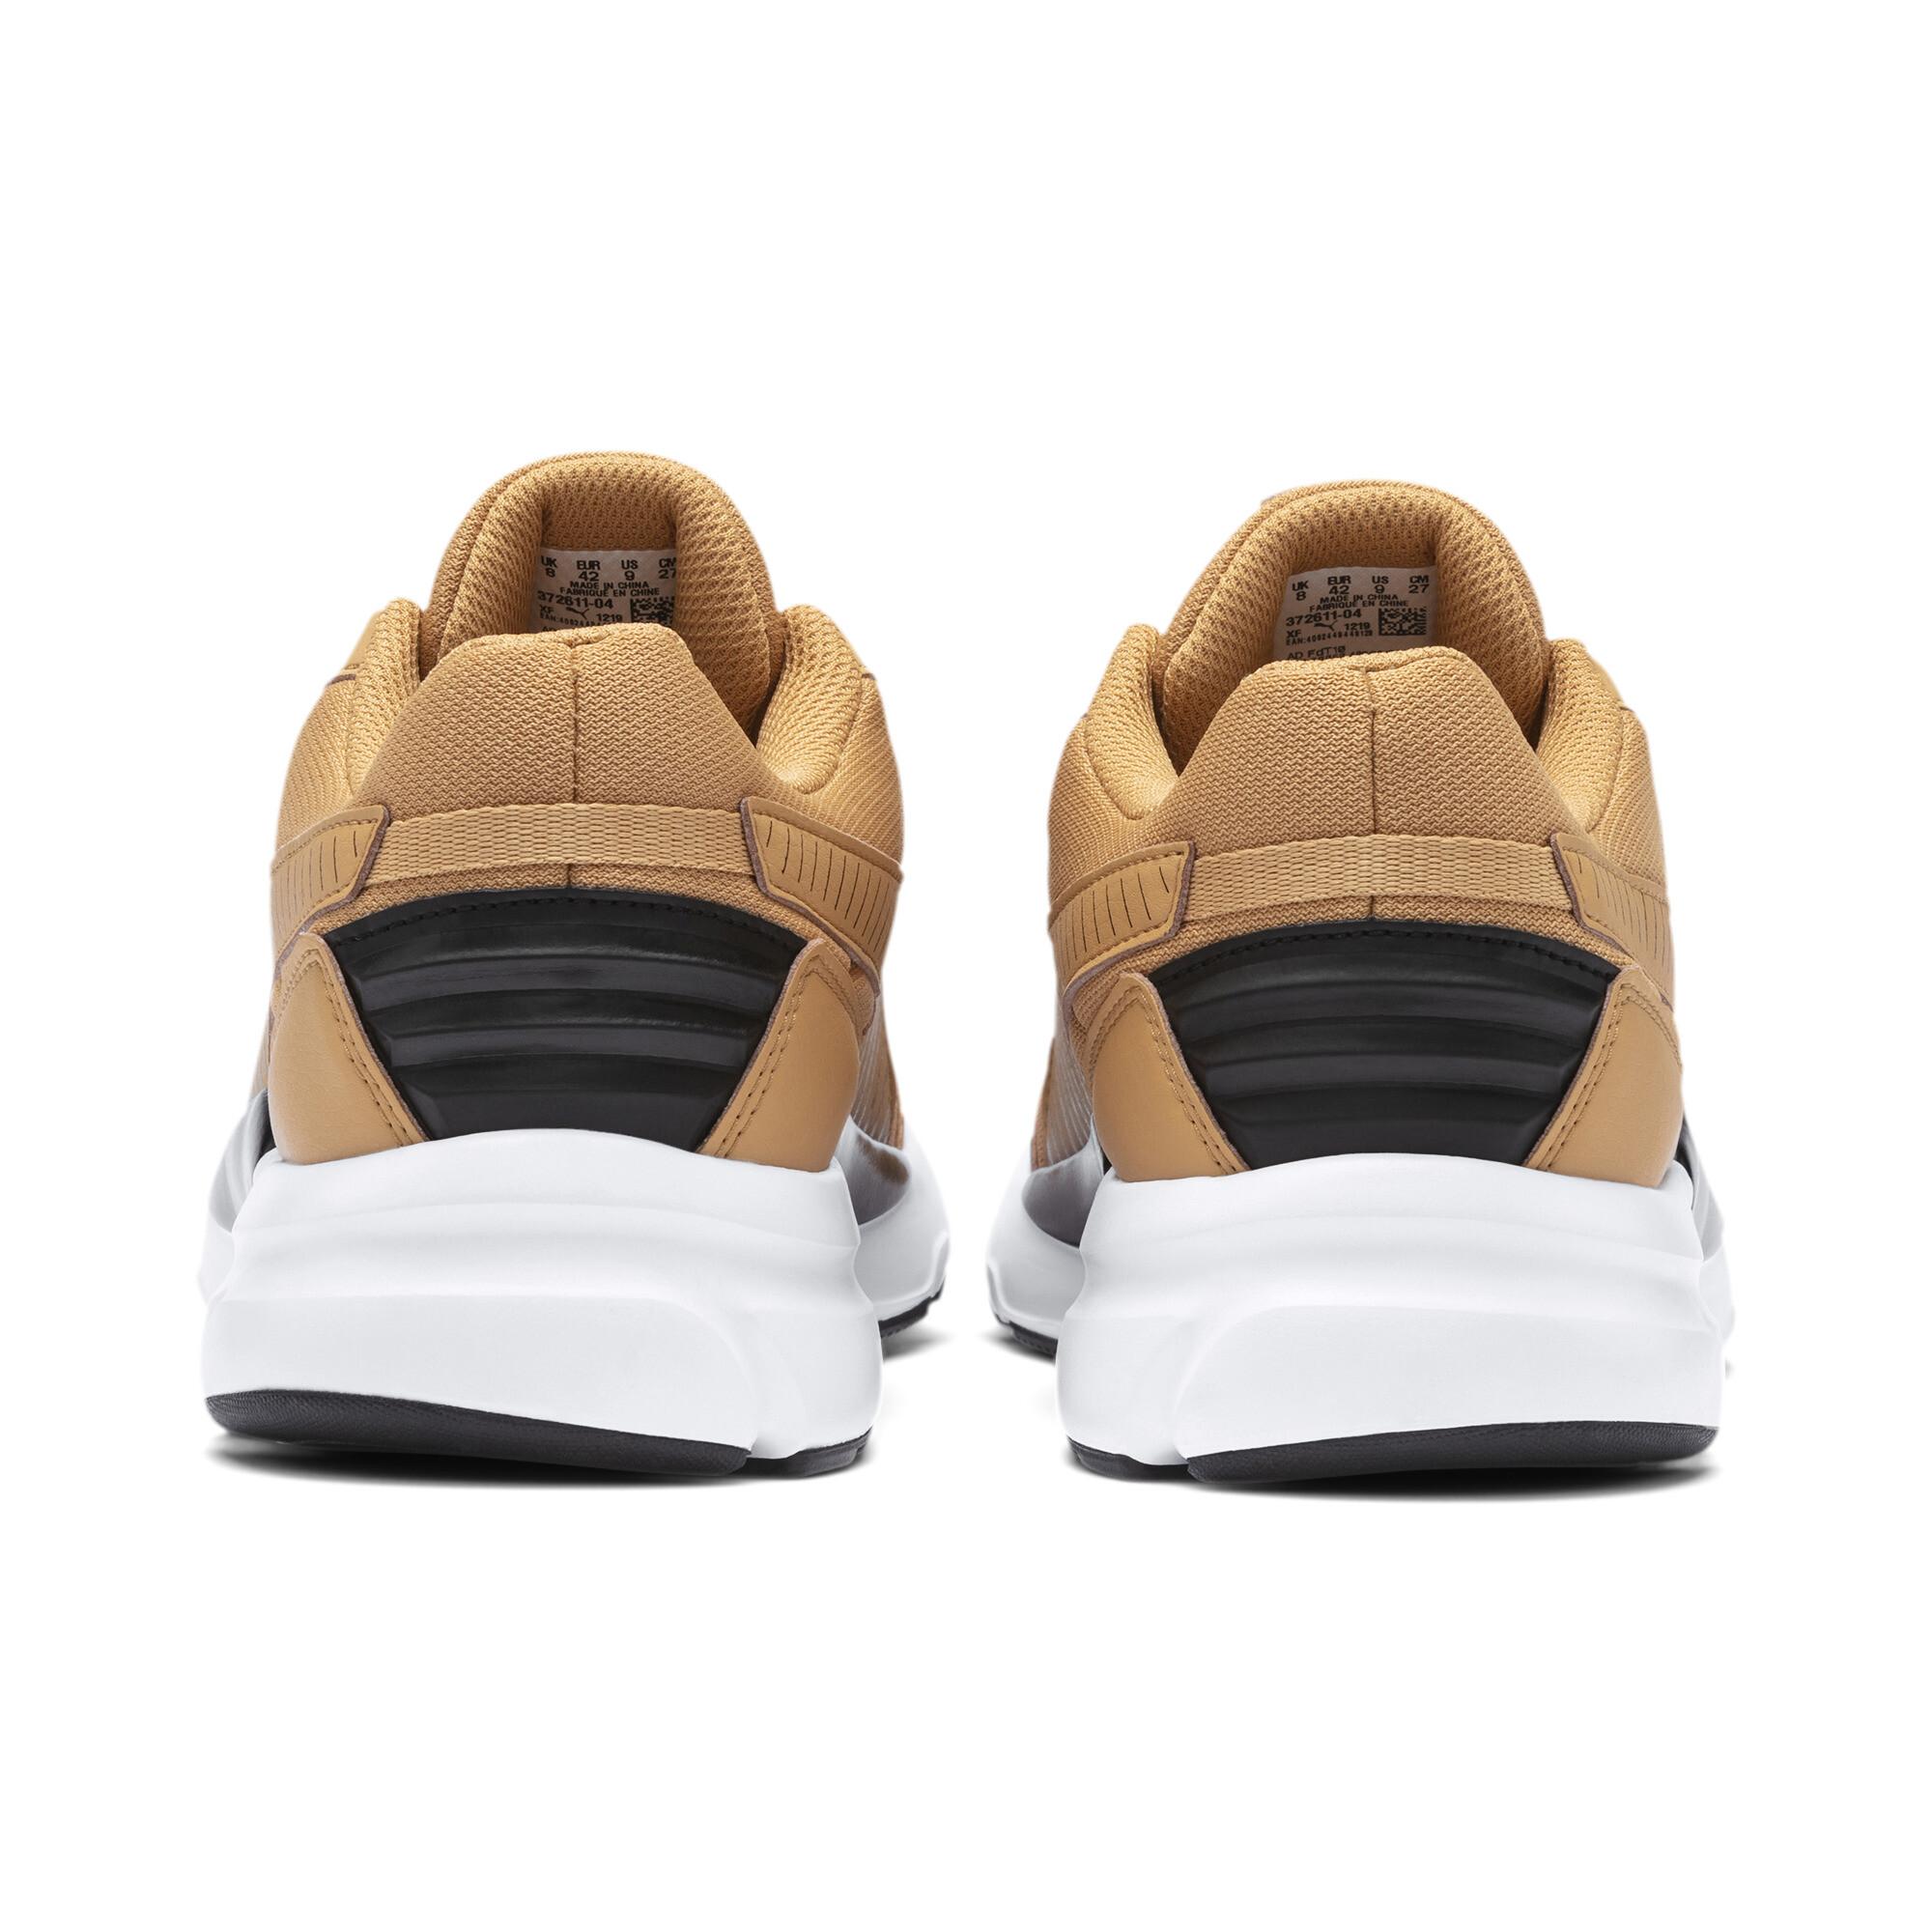 PUMA-Future-Runner-SL-Sneaker-Unisex-Schuhe-Basics-Neu Indexbild 7